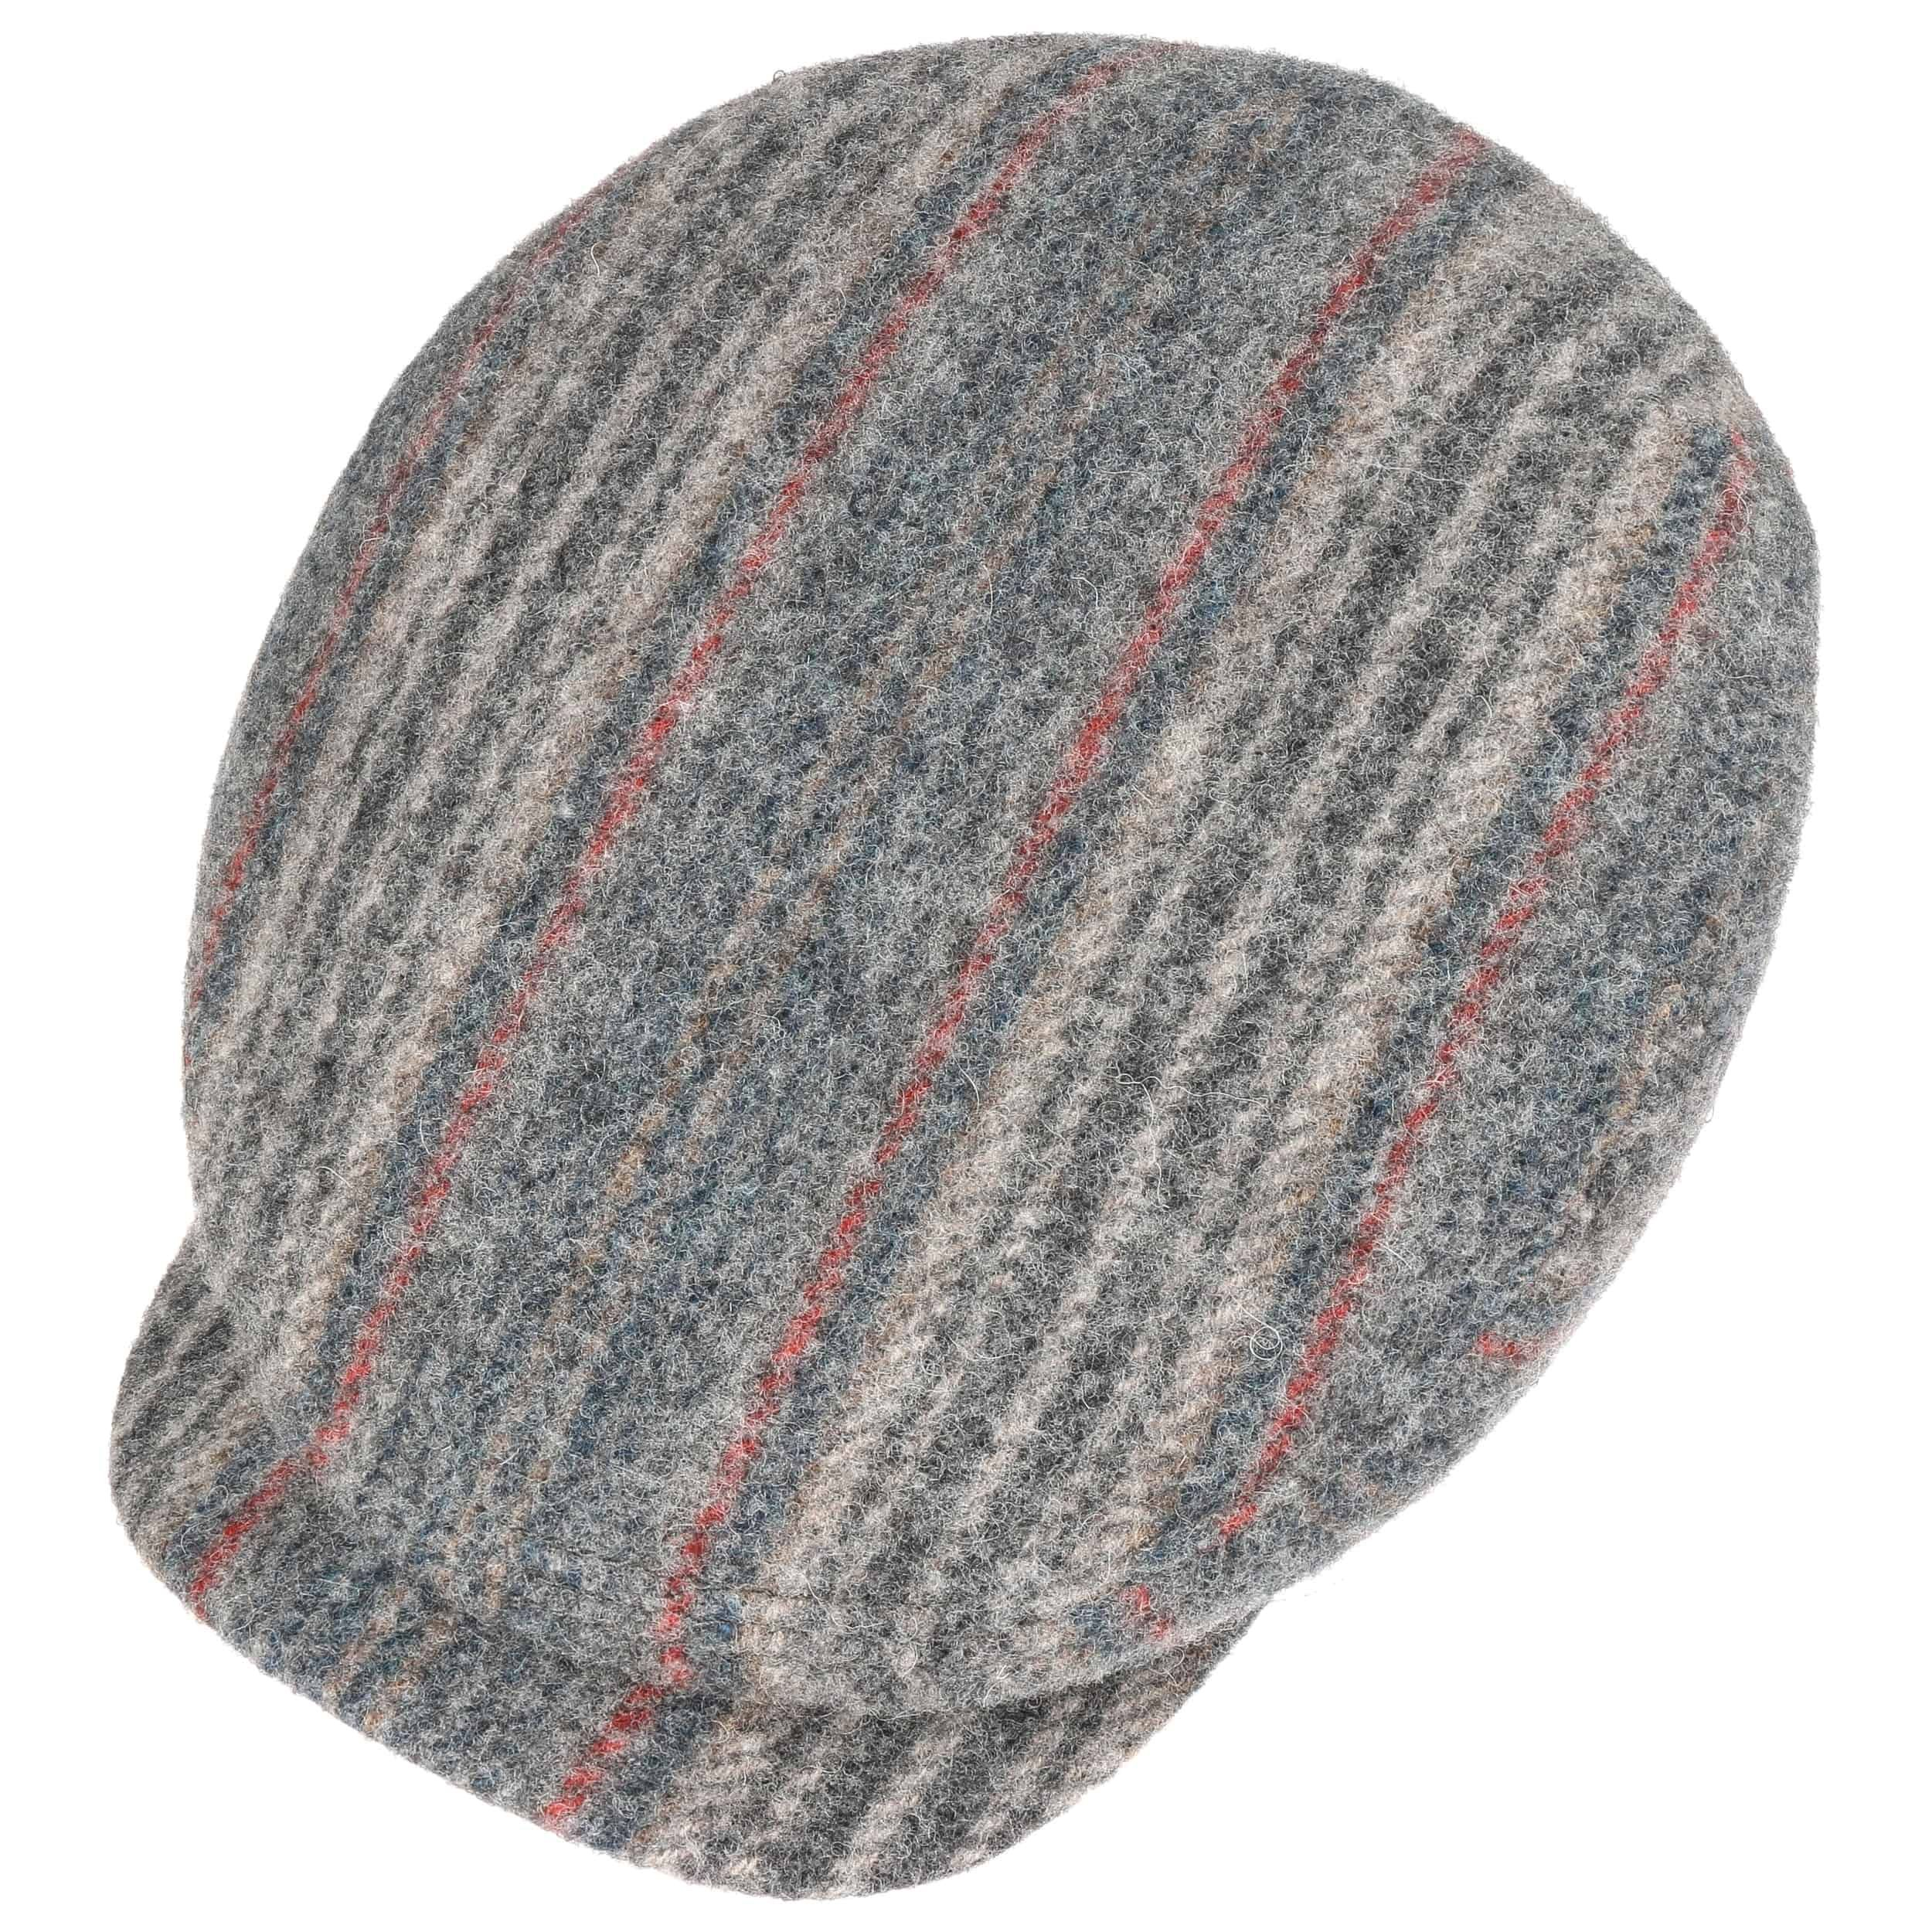 Neligh Woolrich Stripes Flat Cap grey